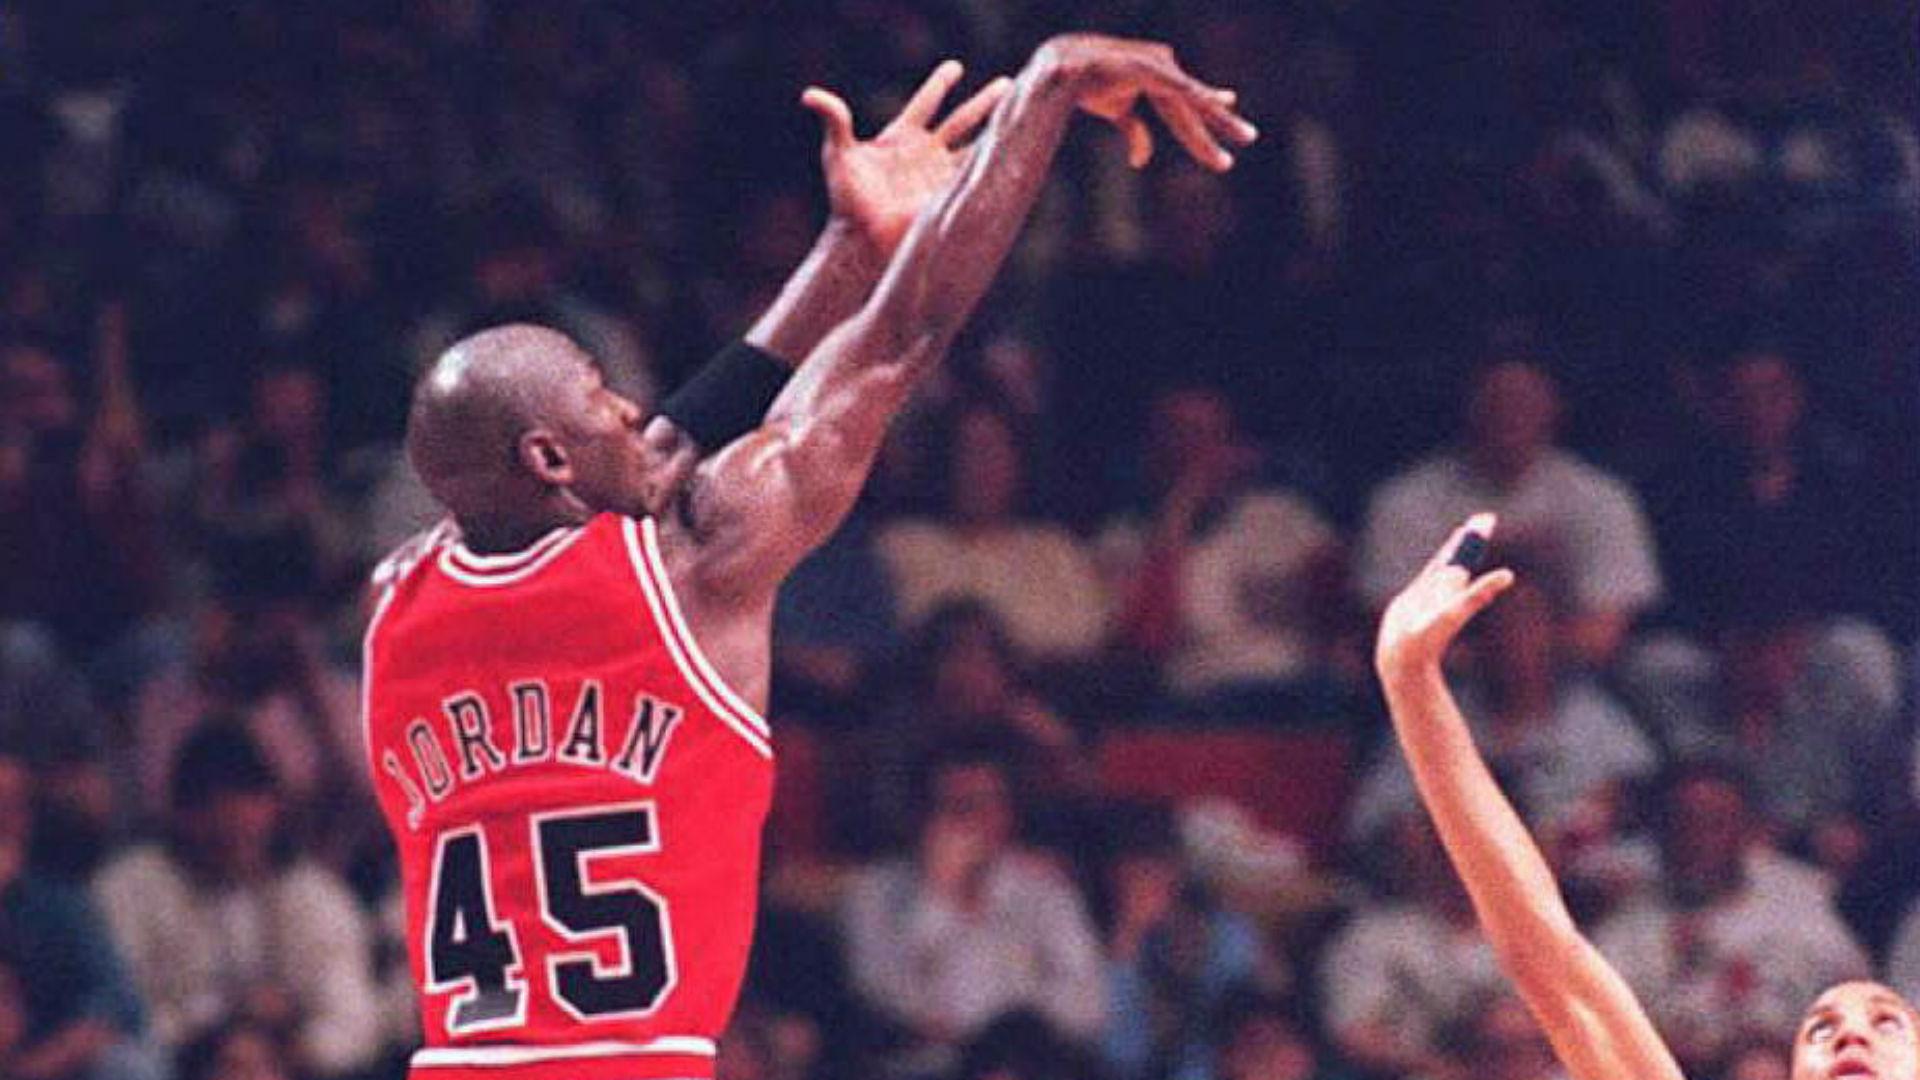 michael jordan 45 jersey